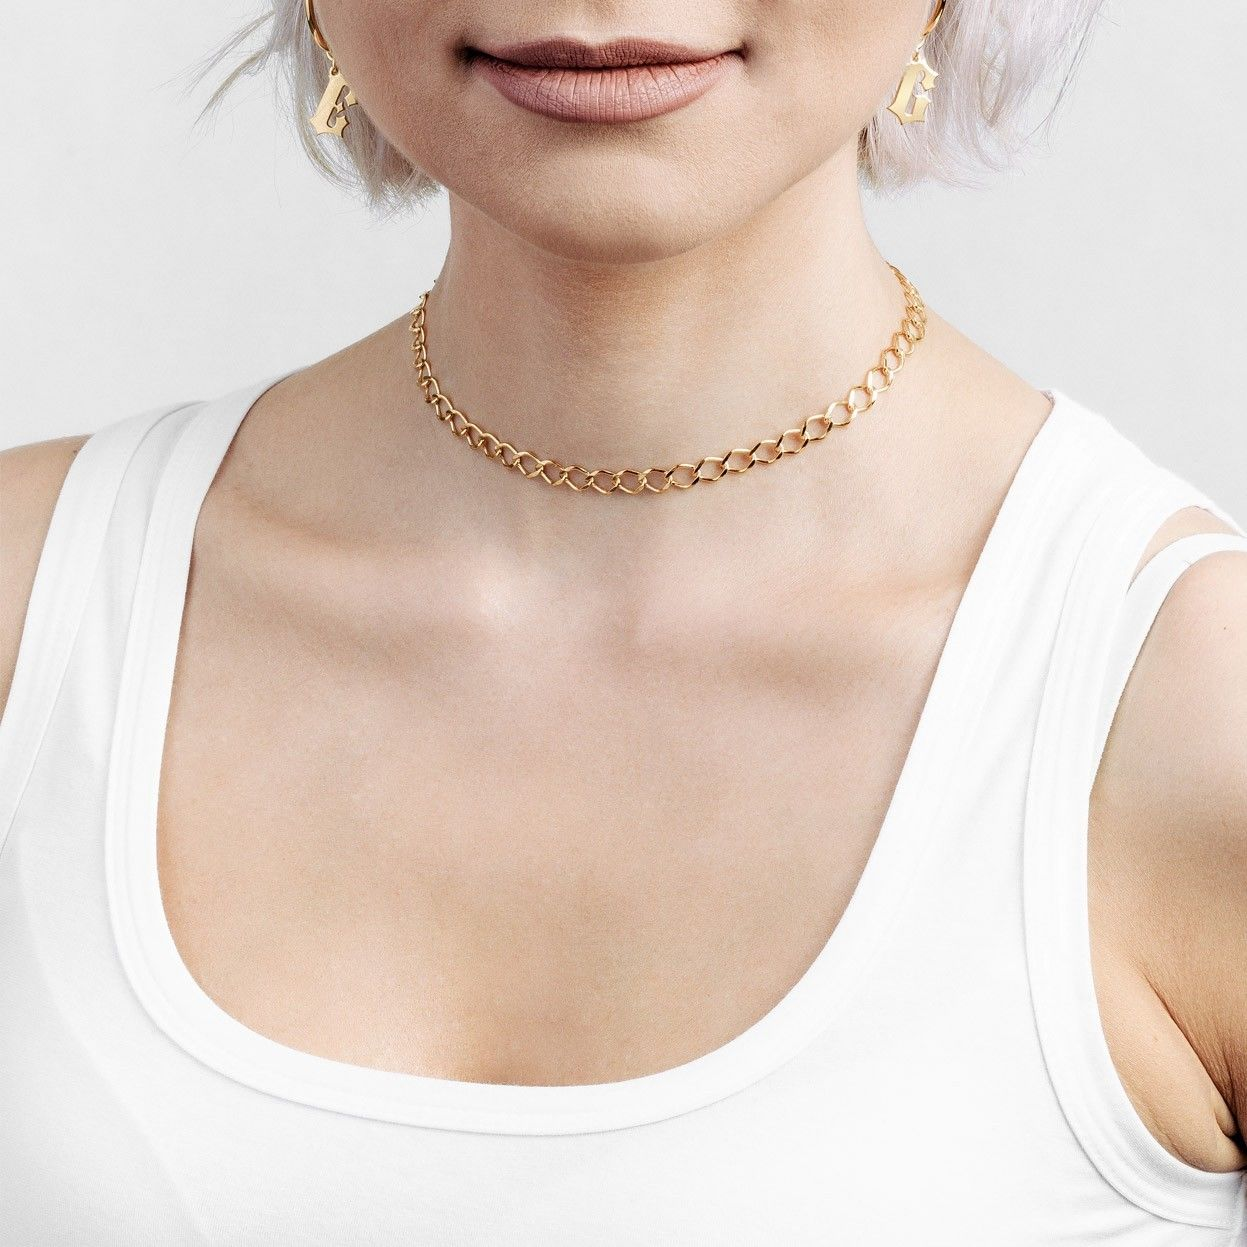 Srebrny łańcuszek choker rombo, srebro 925 : Długość (cm) - 35 + 5, Srebro - kolor pokrycia - Pokrycie platyną